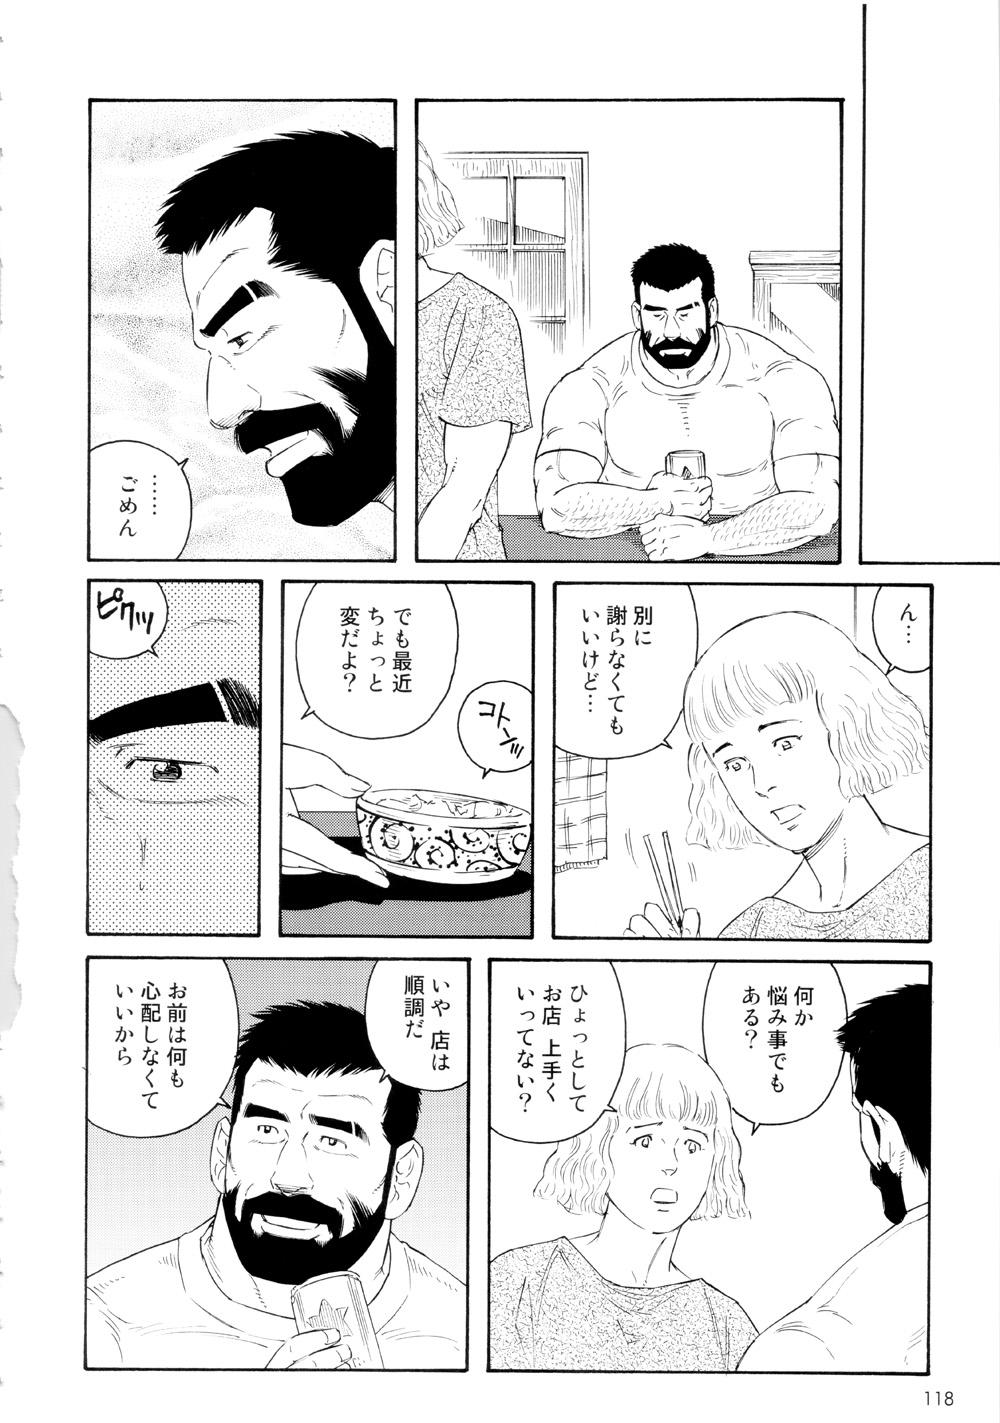 Genryu Chapter 2 11